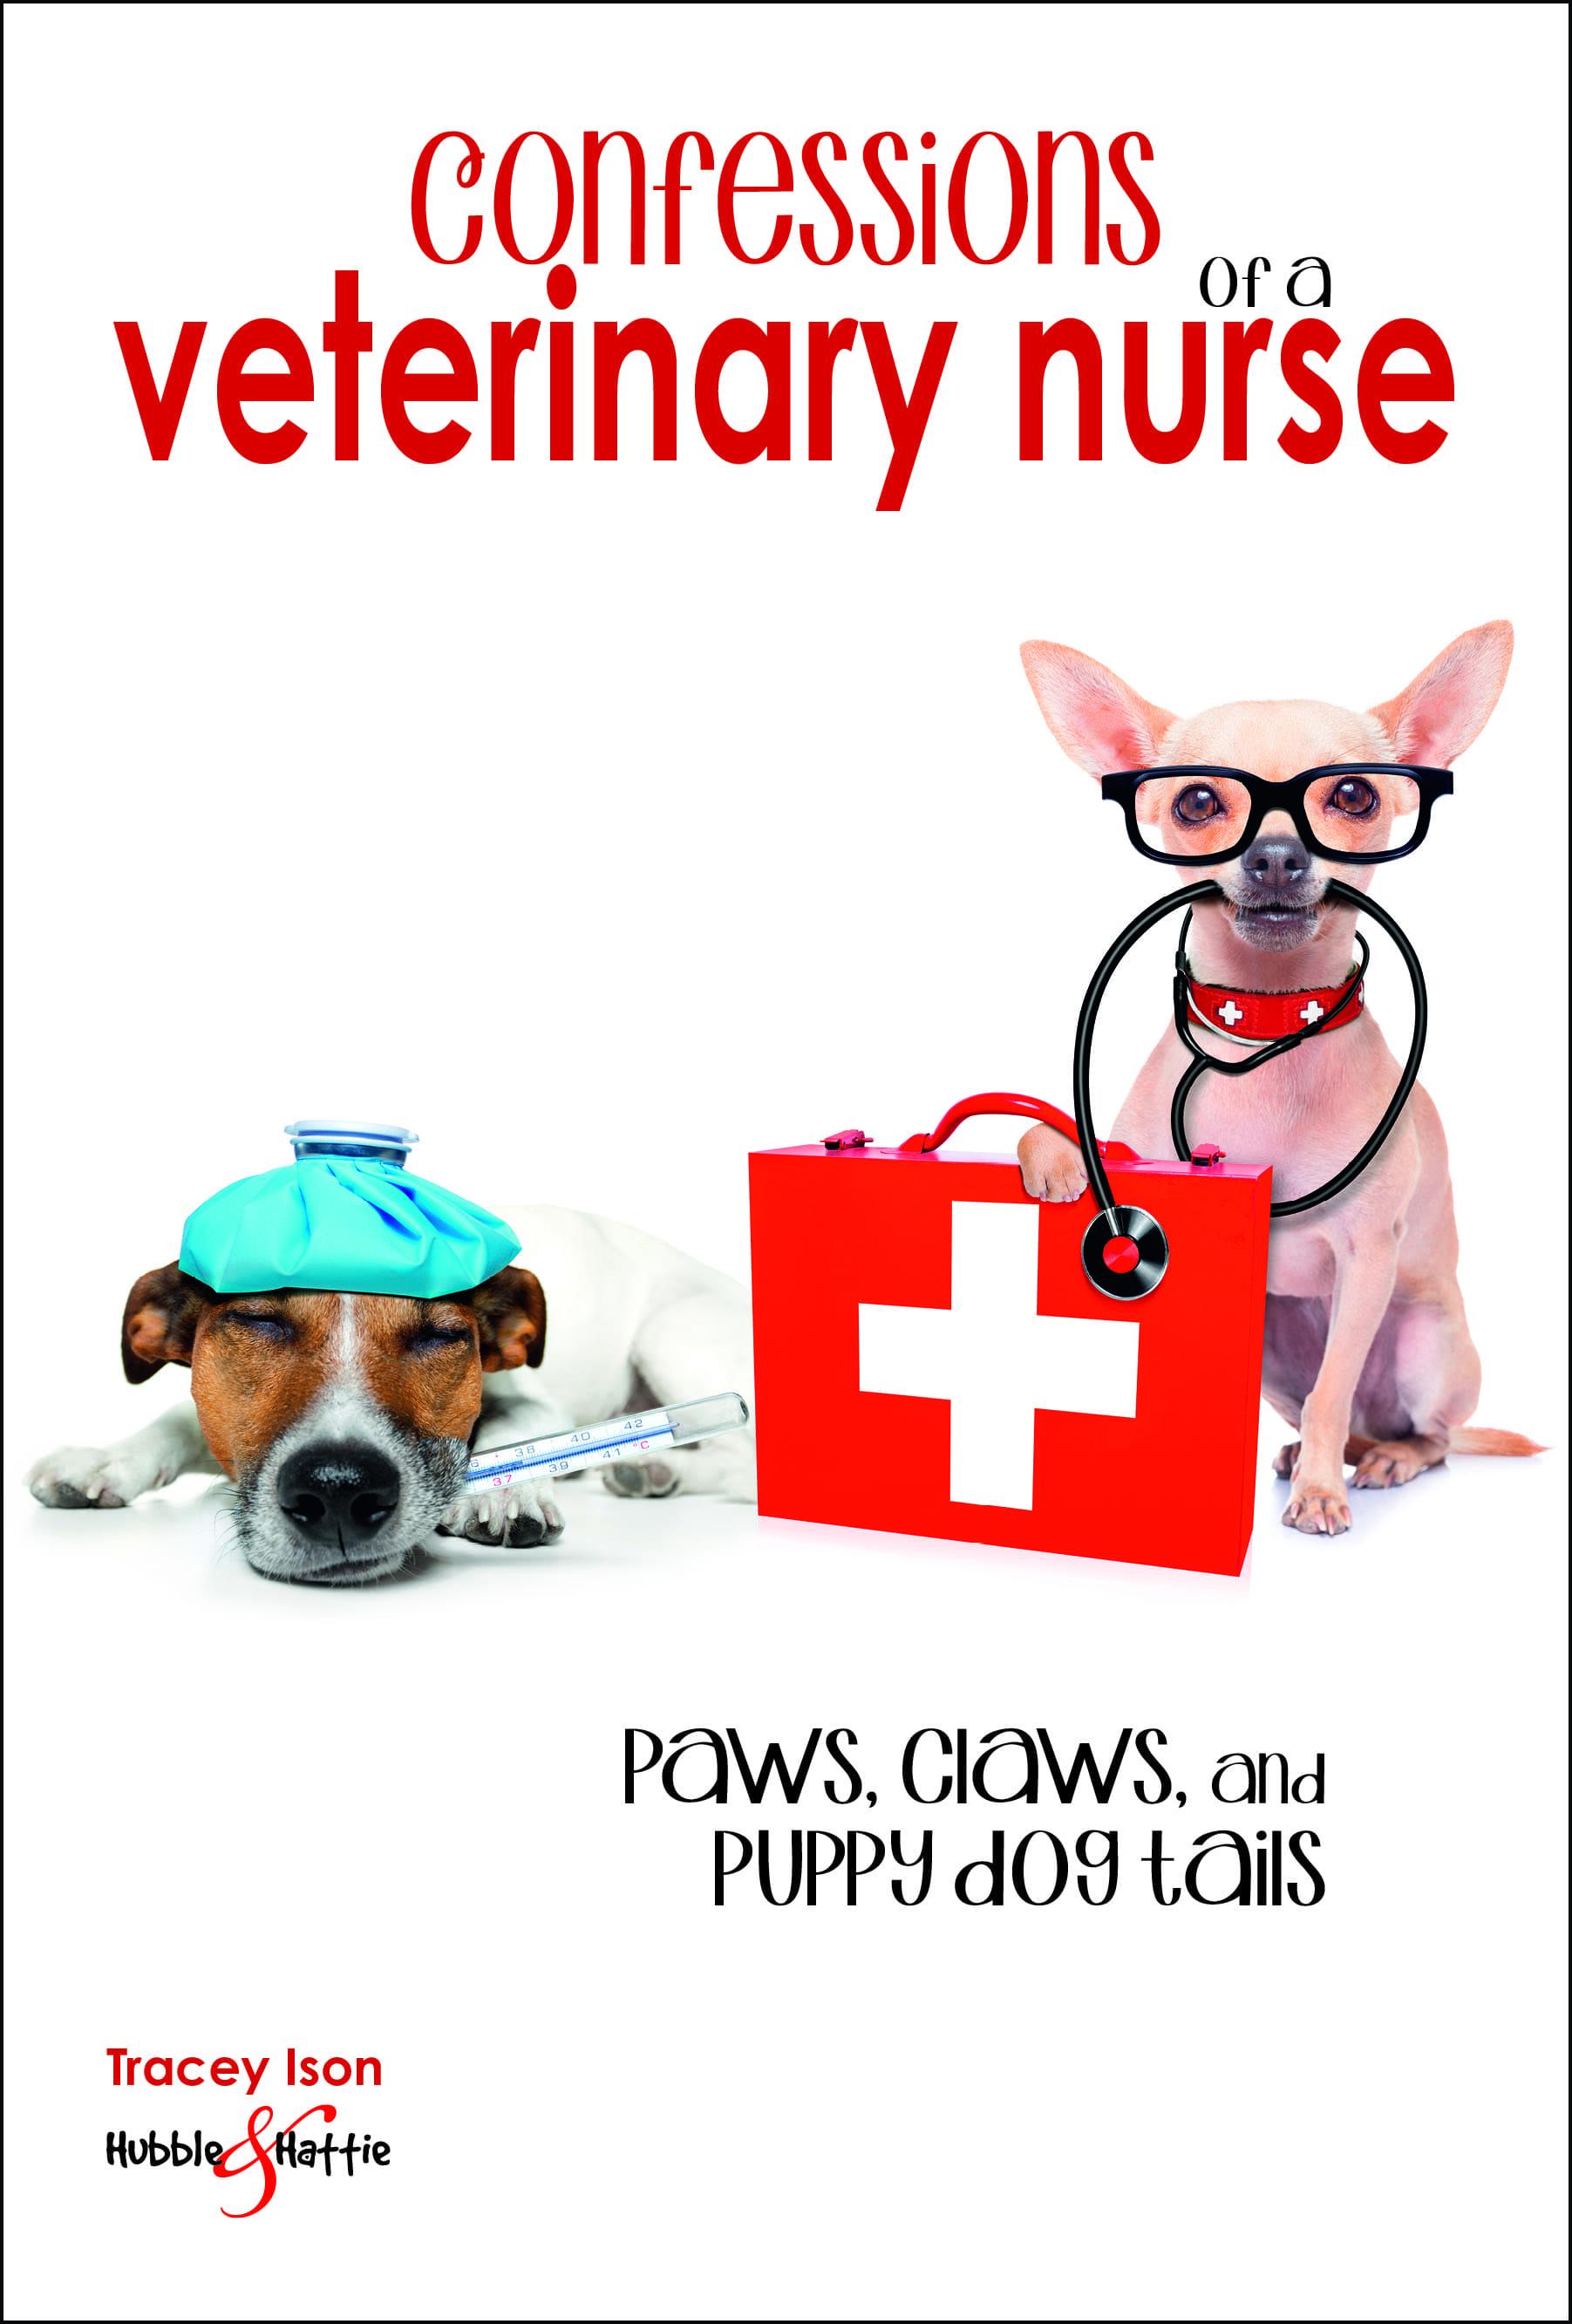 Confressions of a veterinary nurse cover